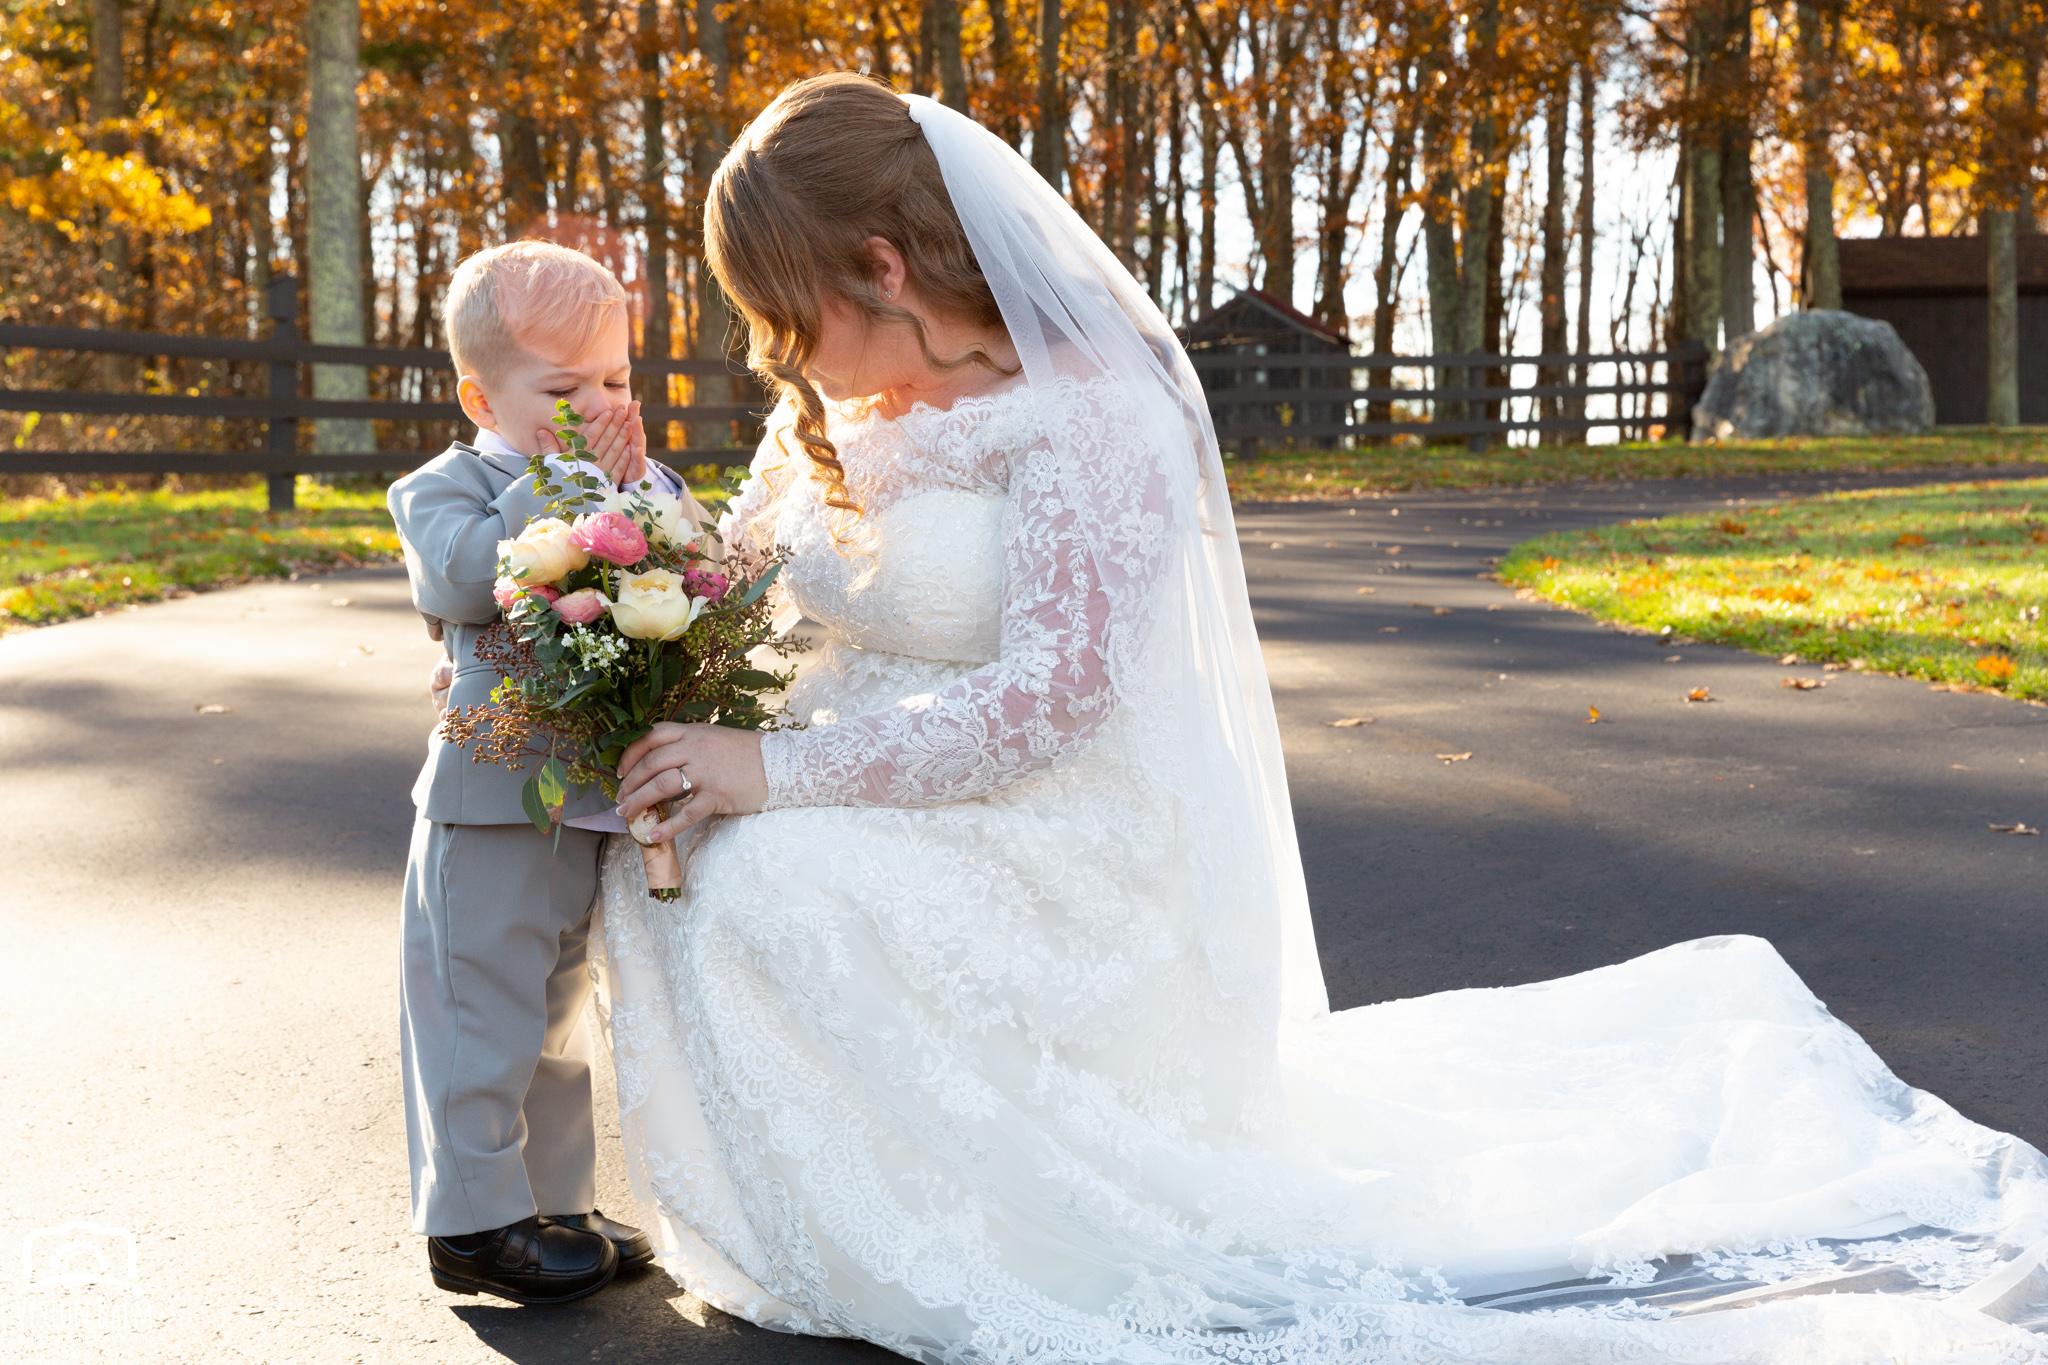 Wedding formal photo of bride and her children in Zuka's Hilltop Barn by Vision Balm in Charleston, SC.